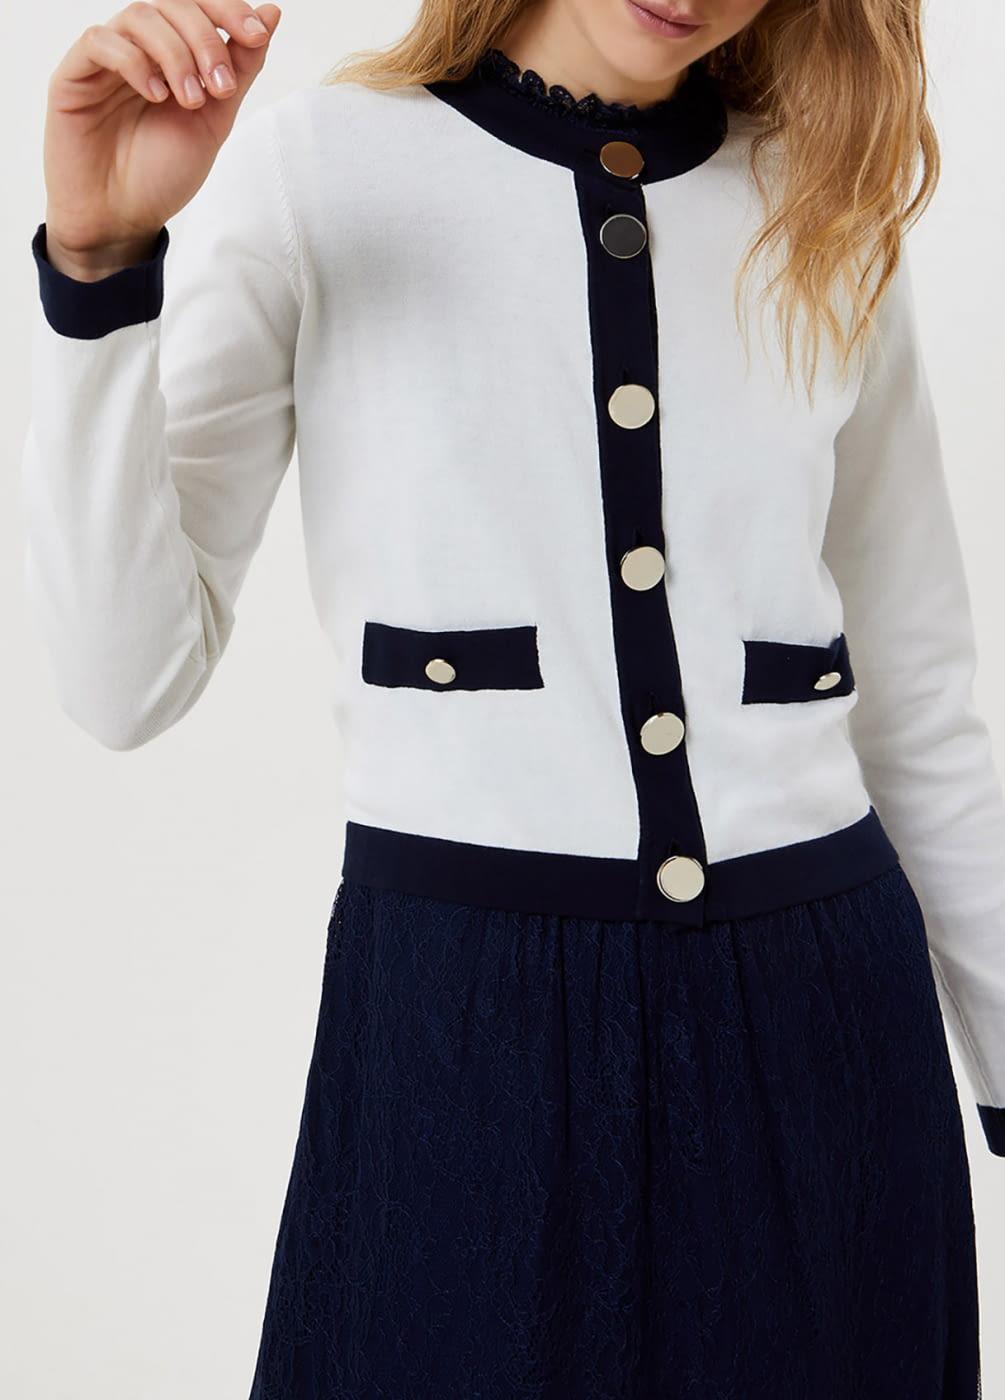 LIU·JO chaqueta crudo y azul marino con logo